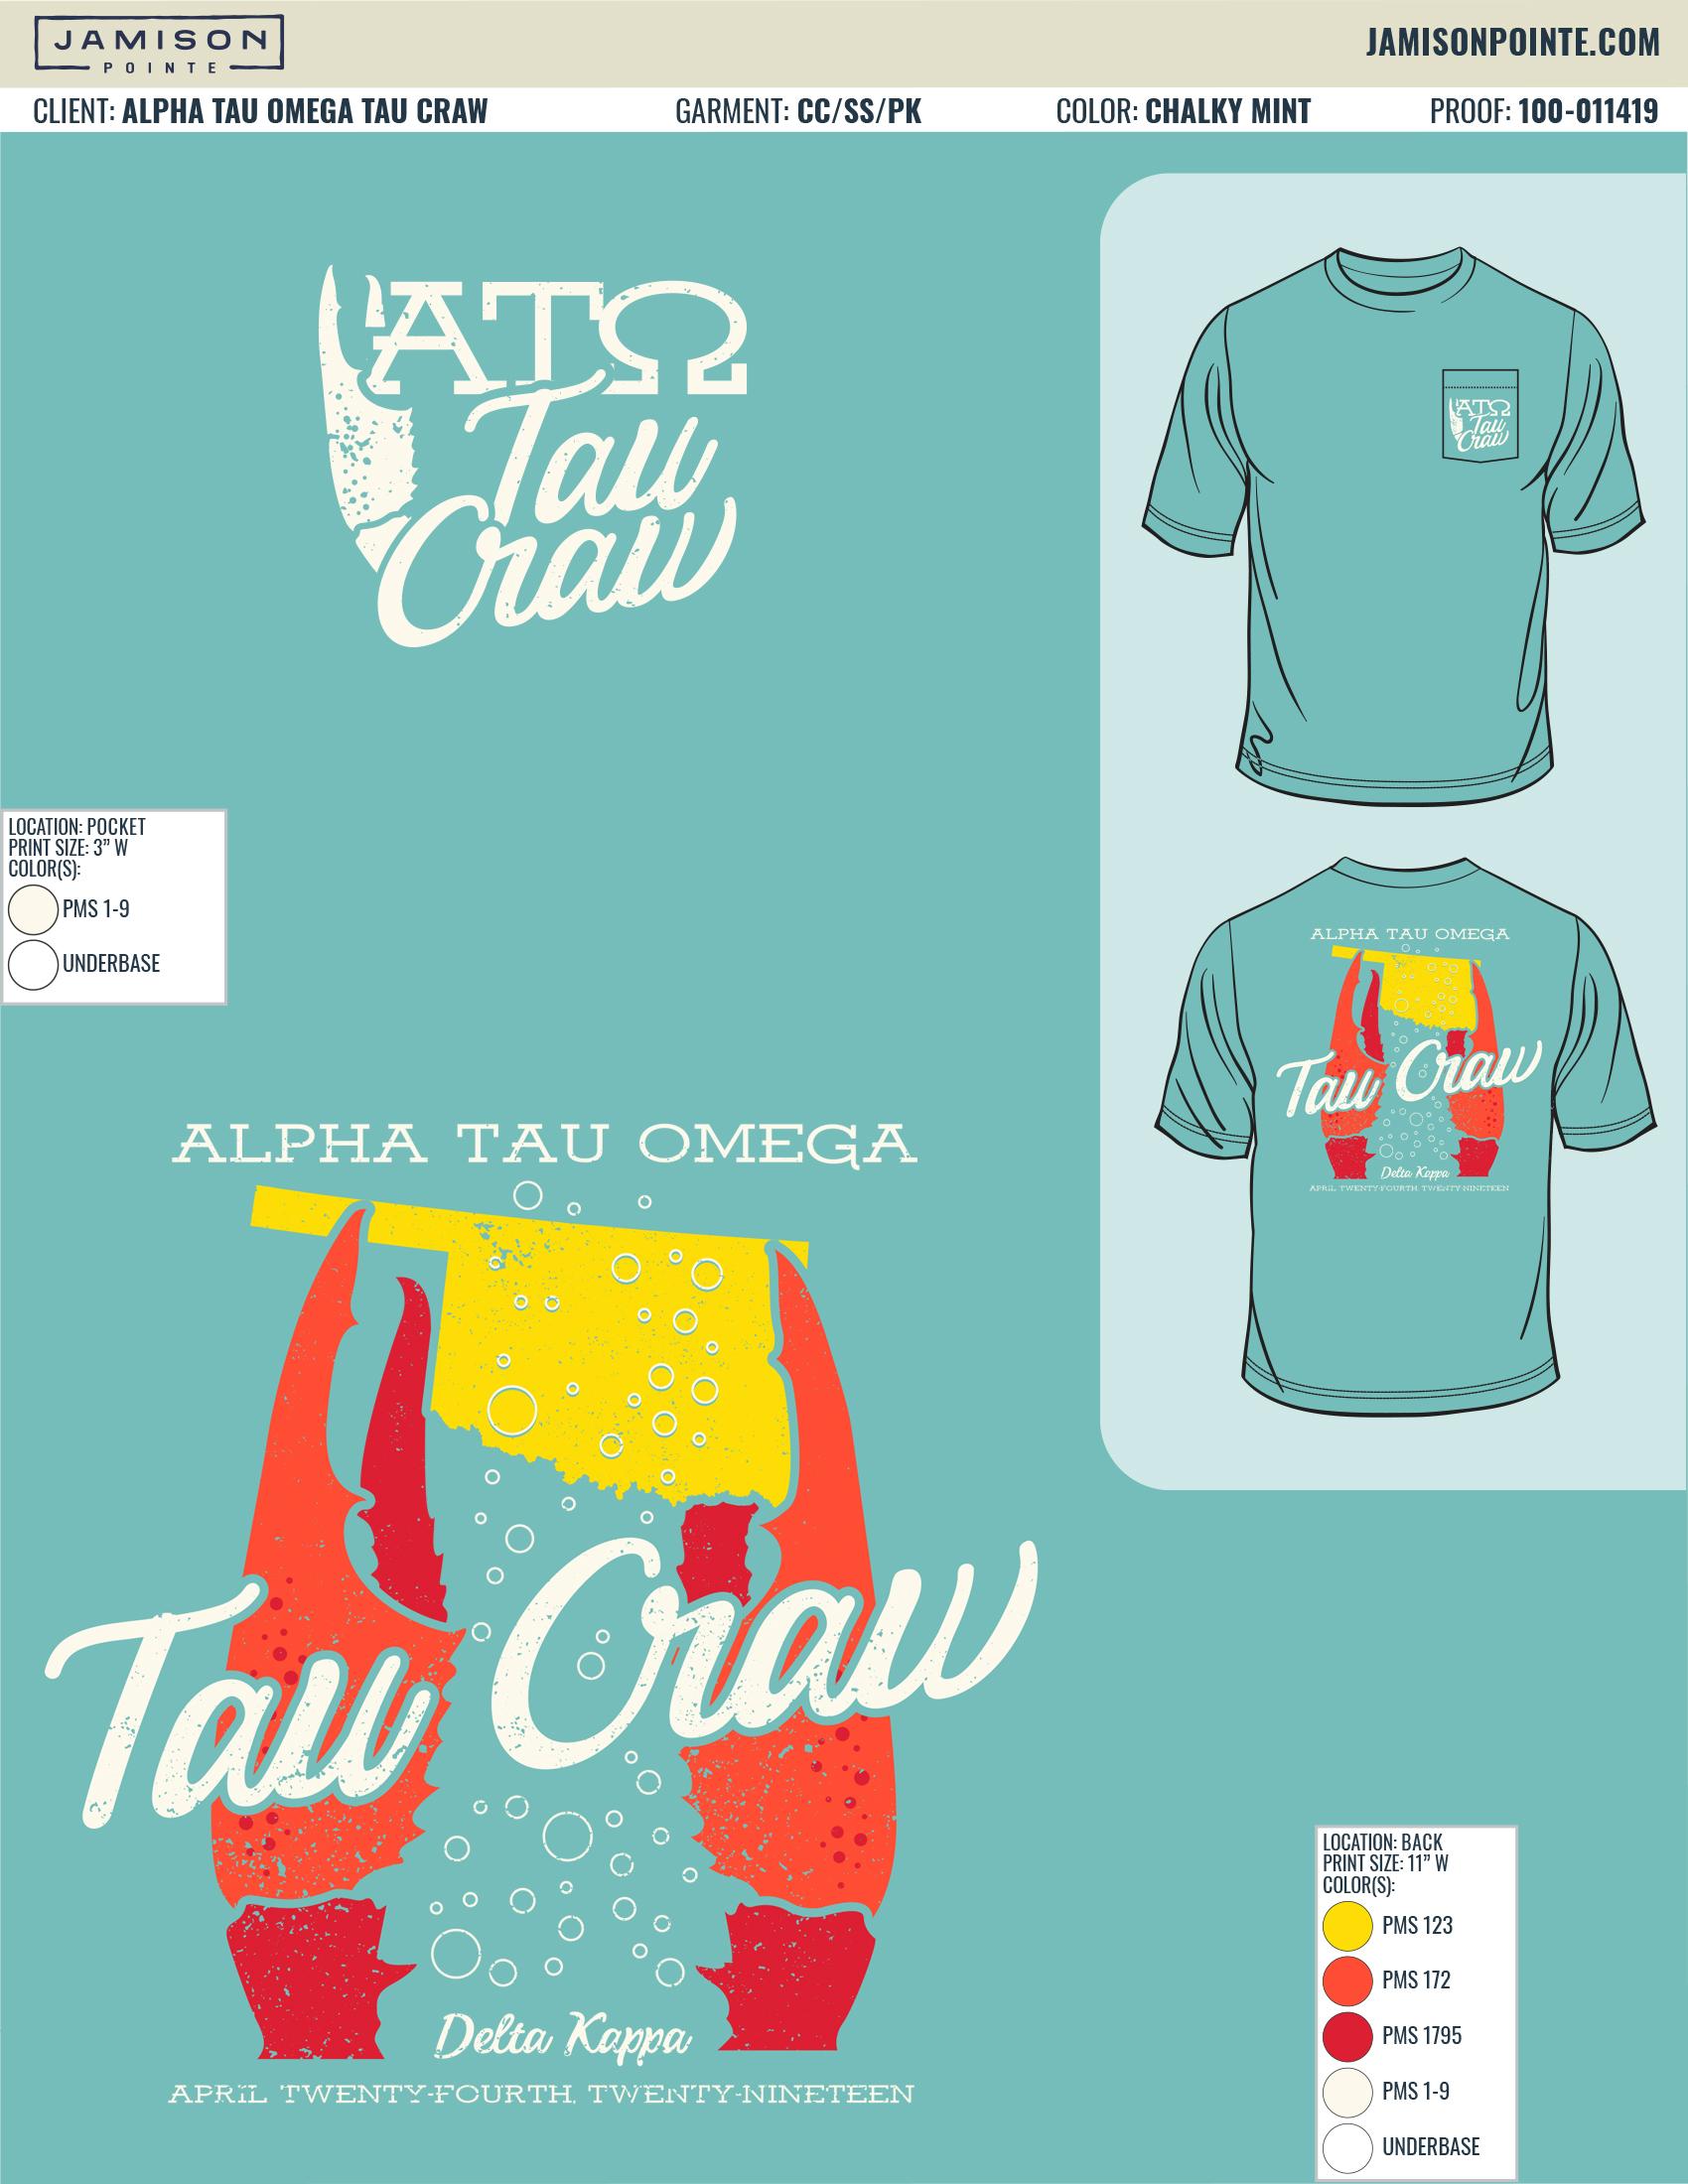 100-011419 Alpha Tau Omega Tau Craw.jpg